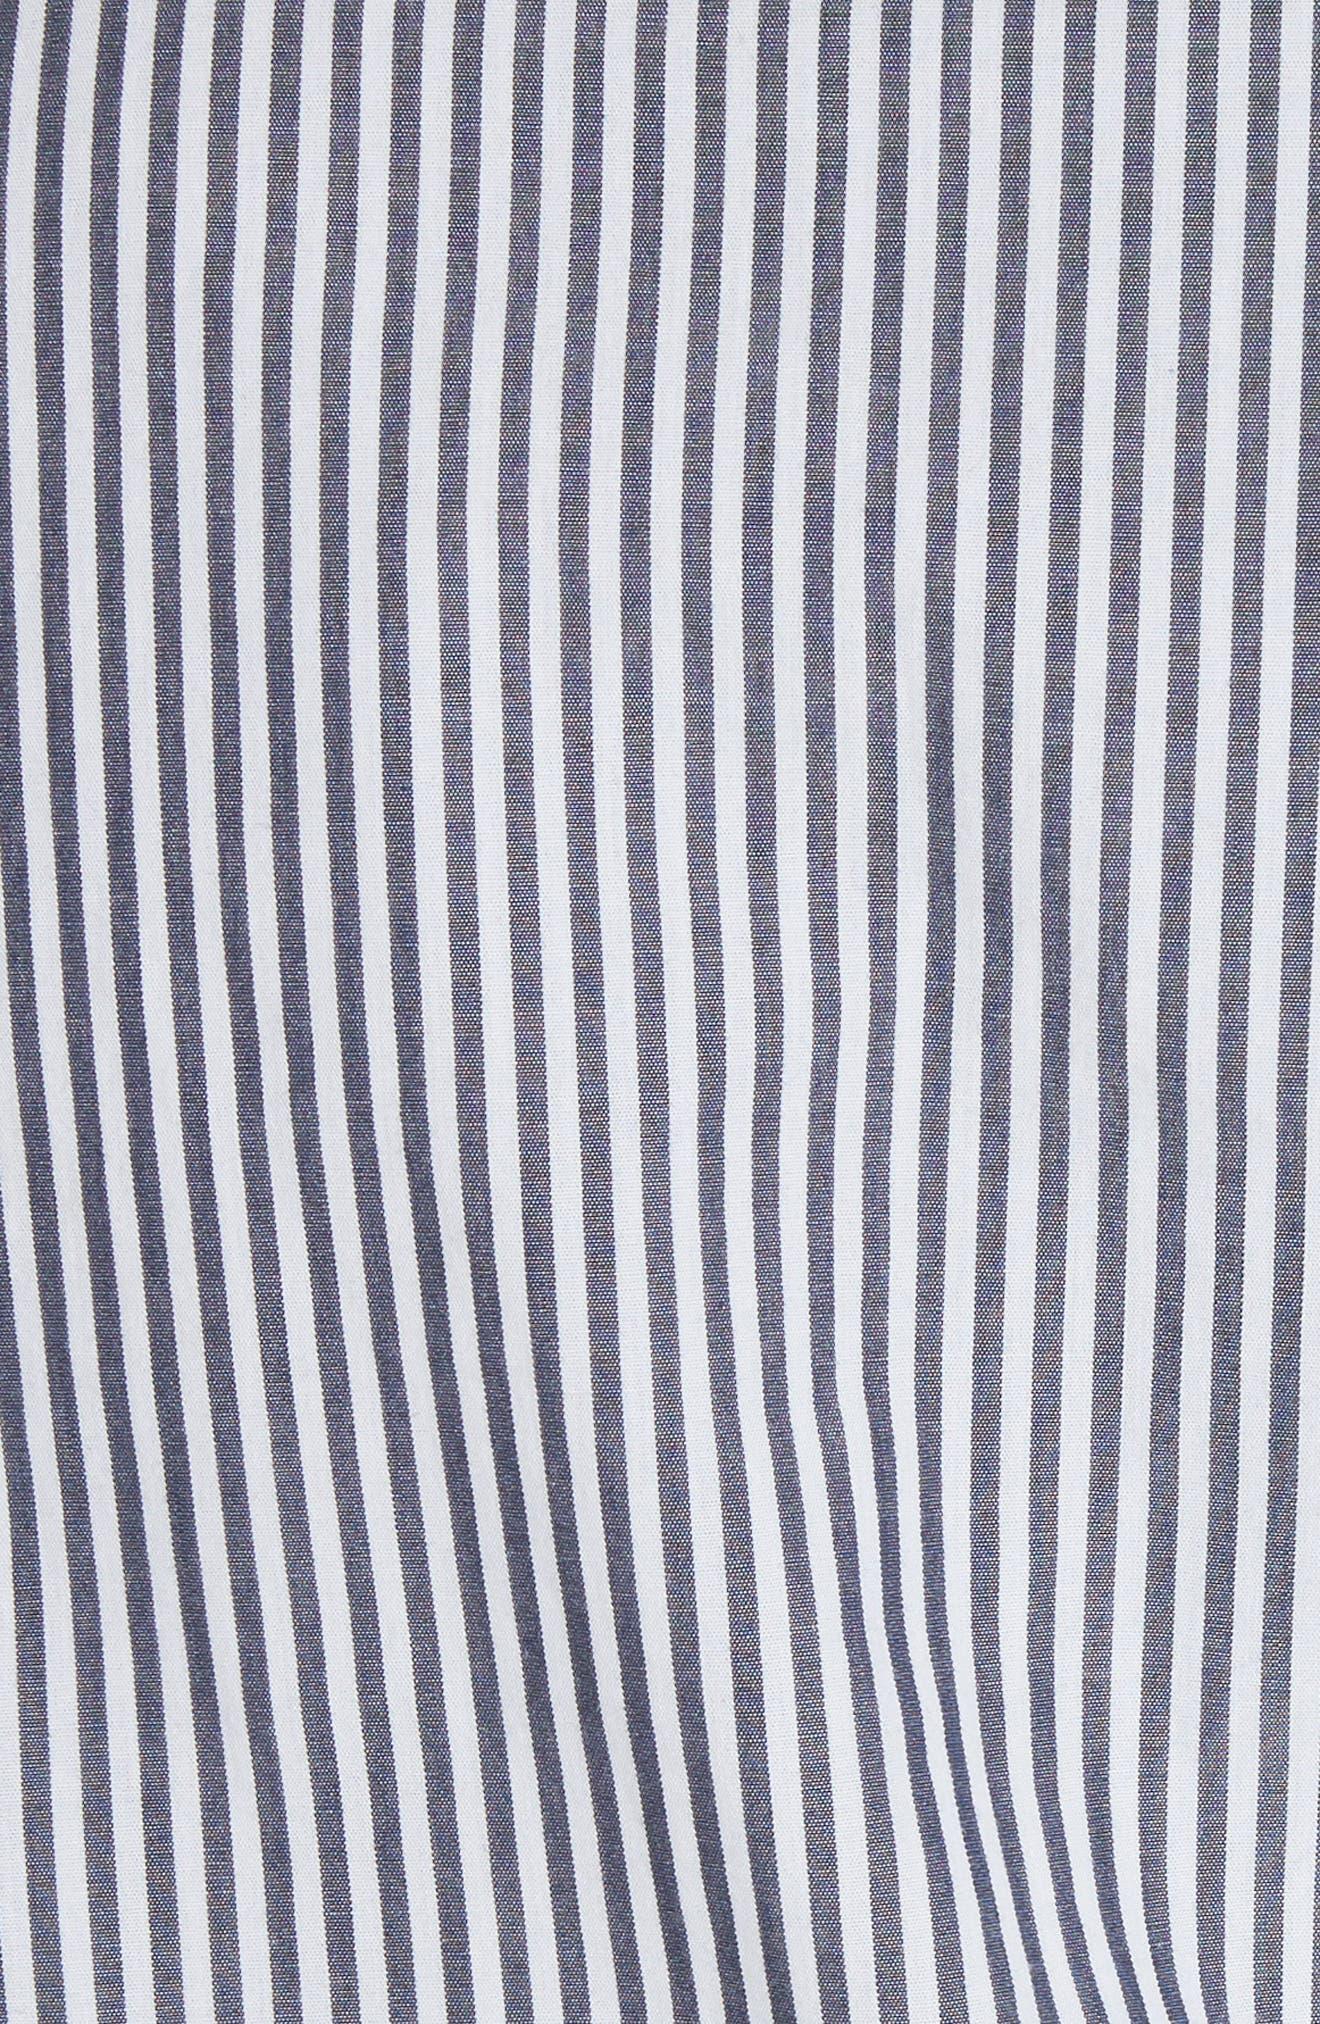 Everett Stripe Shirtdress,                             Alternate thumbnail 5, color,                             Black/ White Stripe